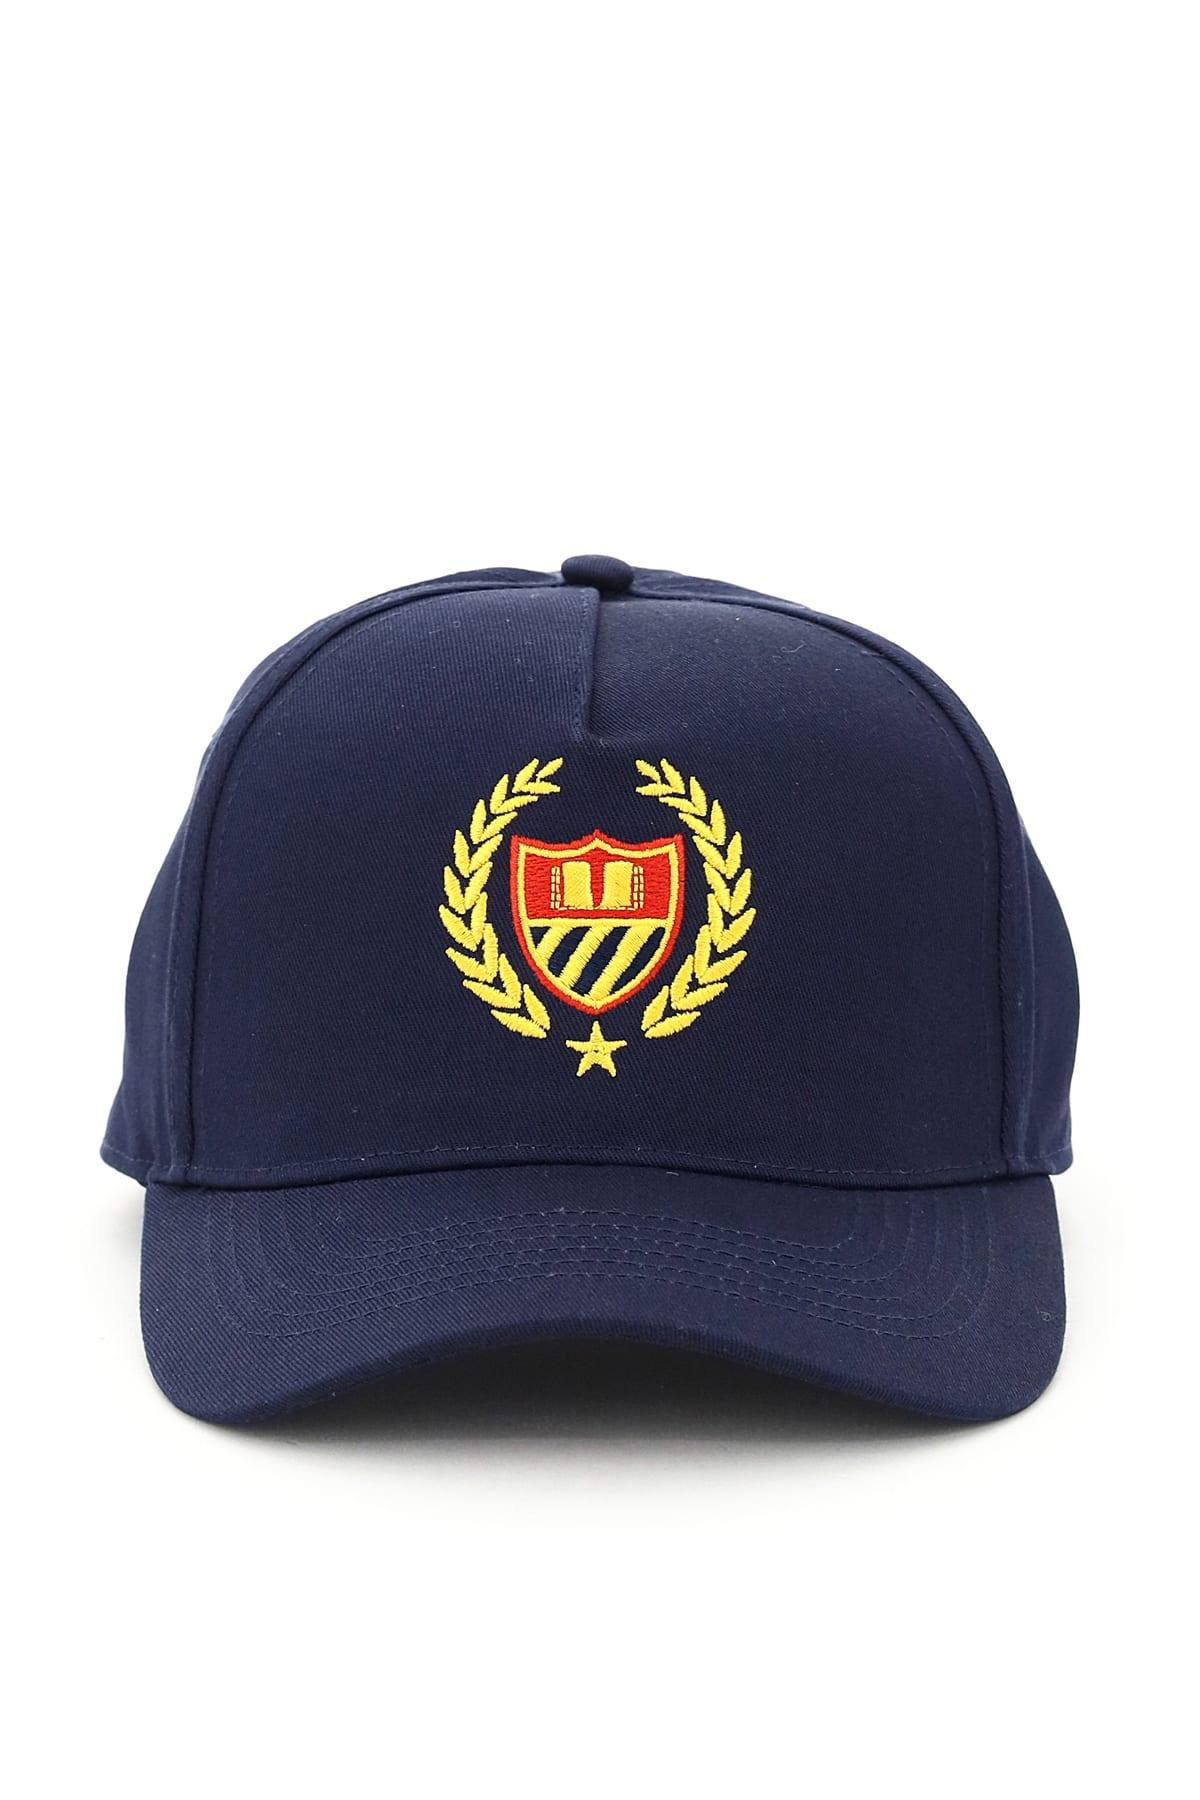 Baseball Cap Academy Crest